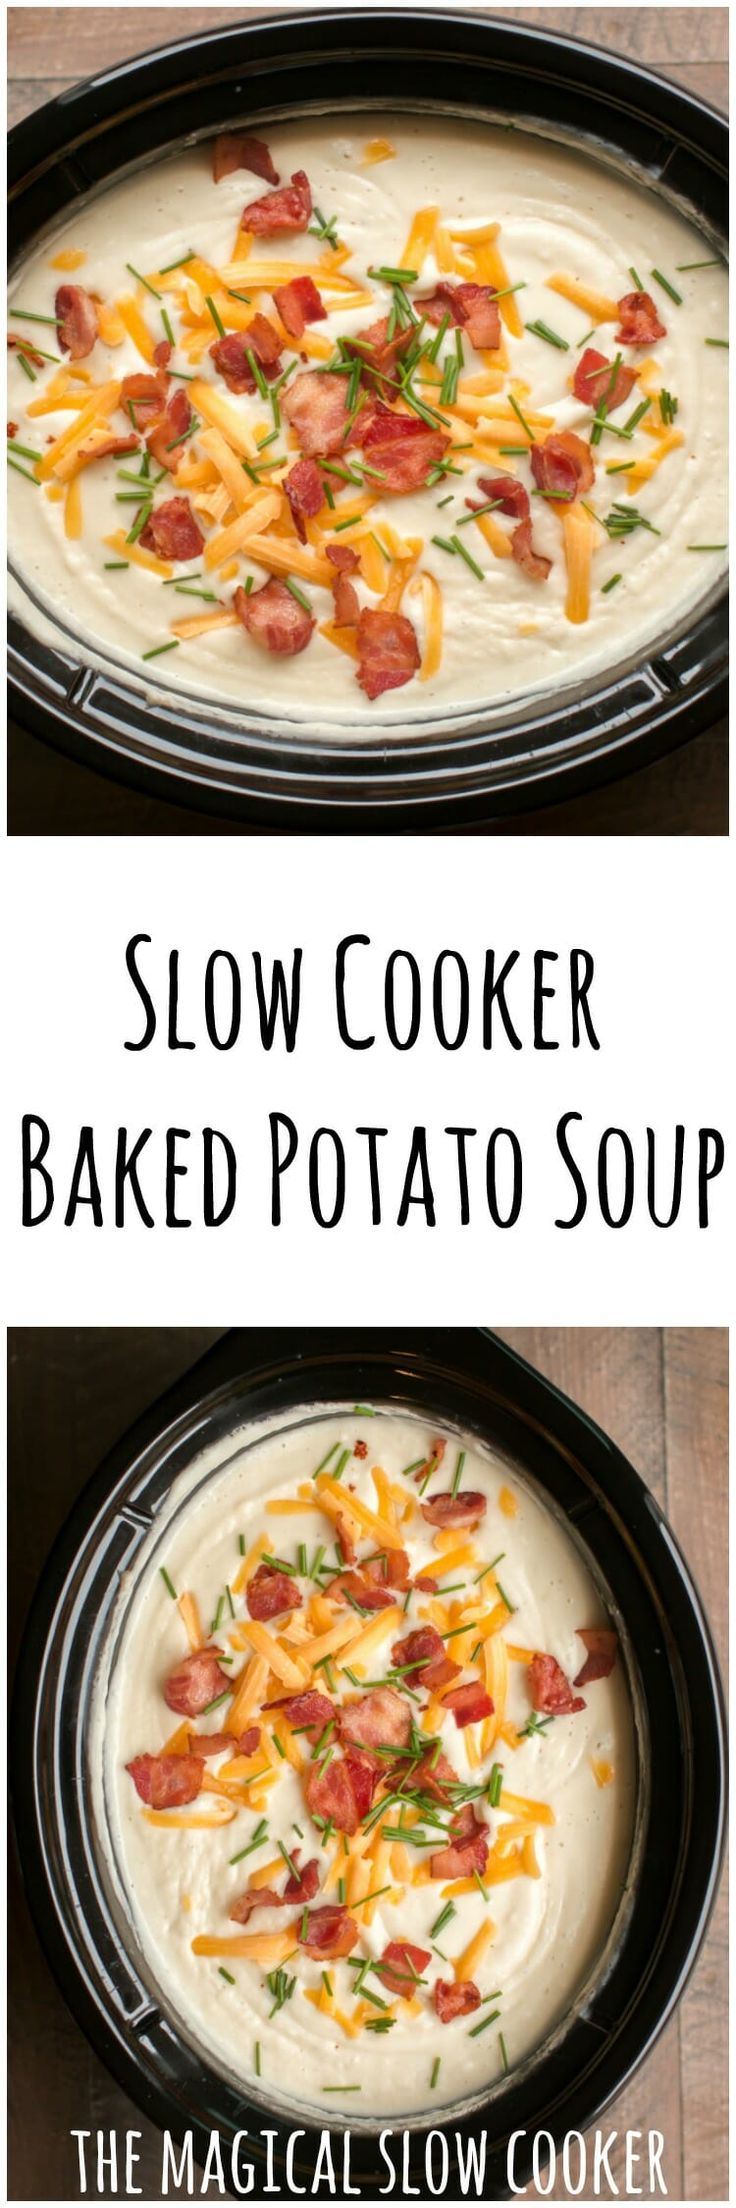 Slow Cooker Baked Potato Soup